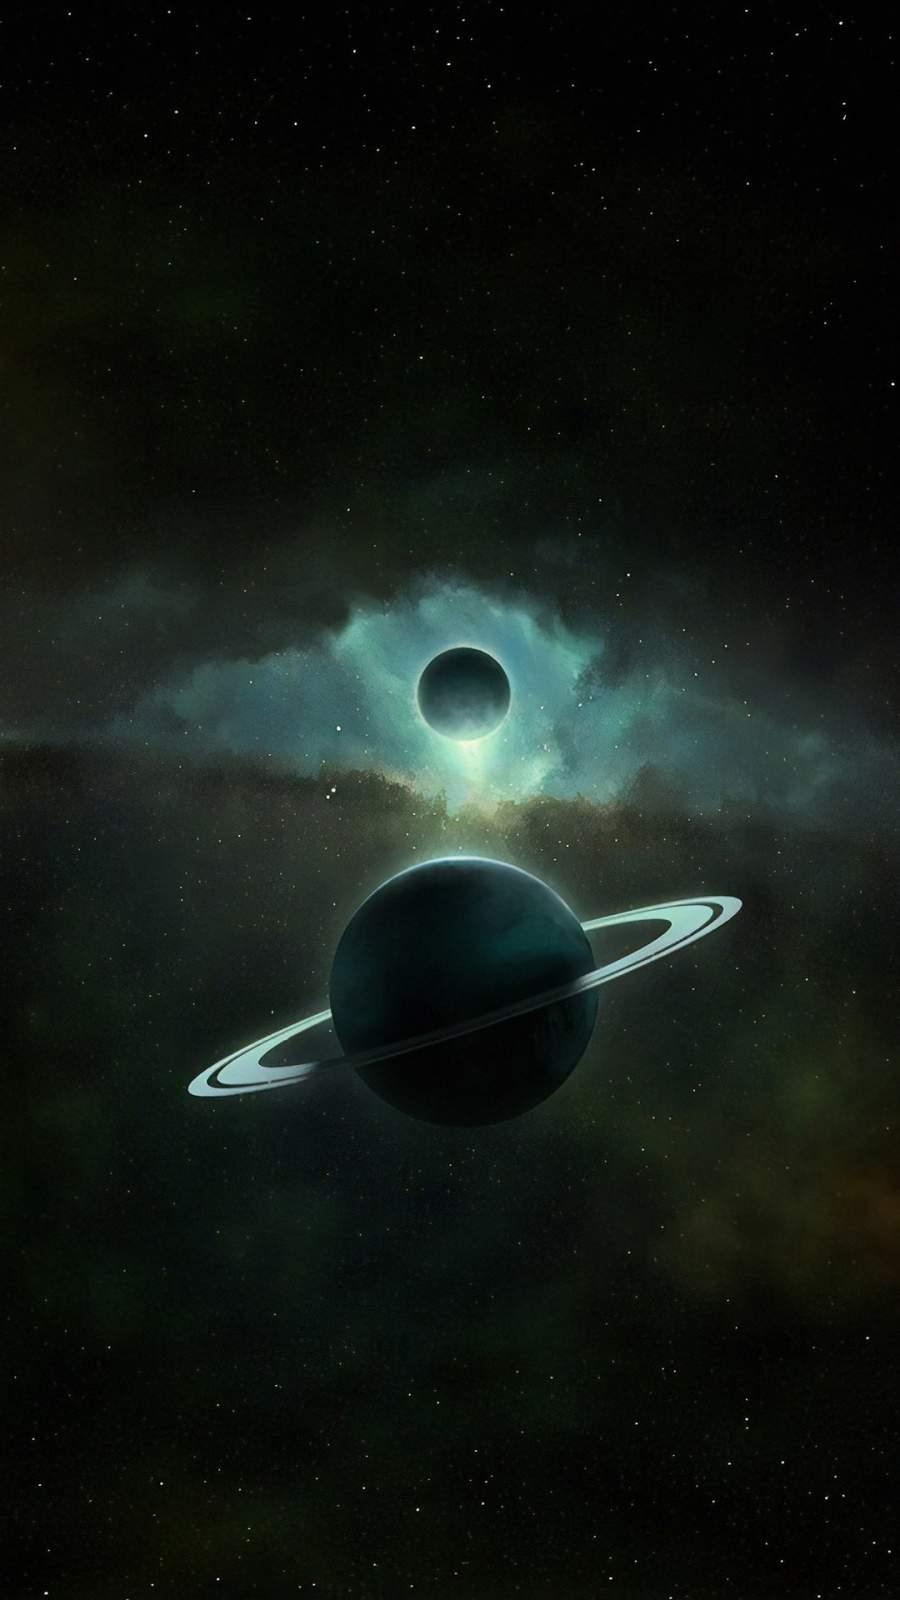 Saturn Planet Art 4K iPhone Wallpaper